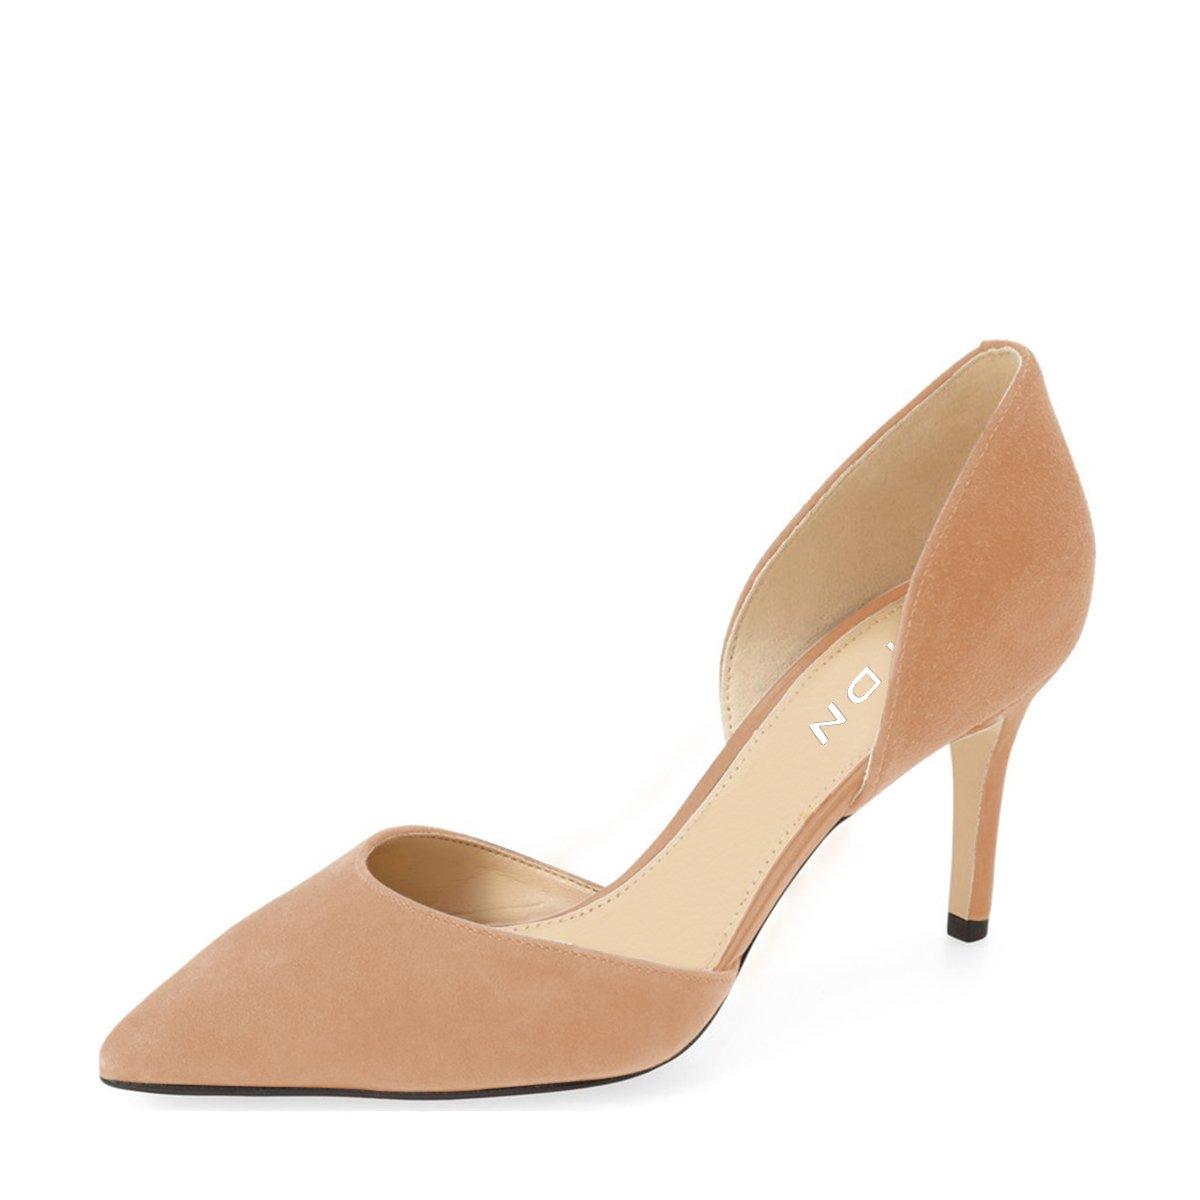 YDN Women Classic Low Heels D'Orsay Pumps Suede Pointed Toe Slip On Dressy Stilettos Shoes B01NBK5WDX 5 B(M) US Nude